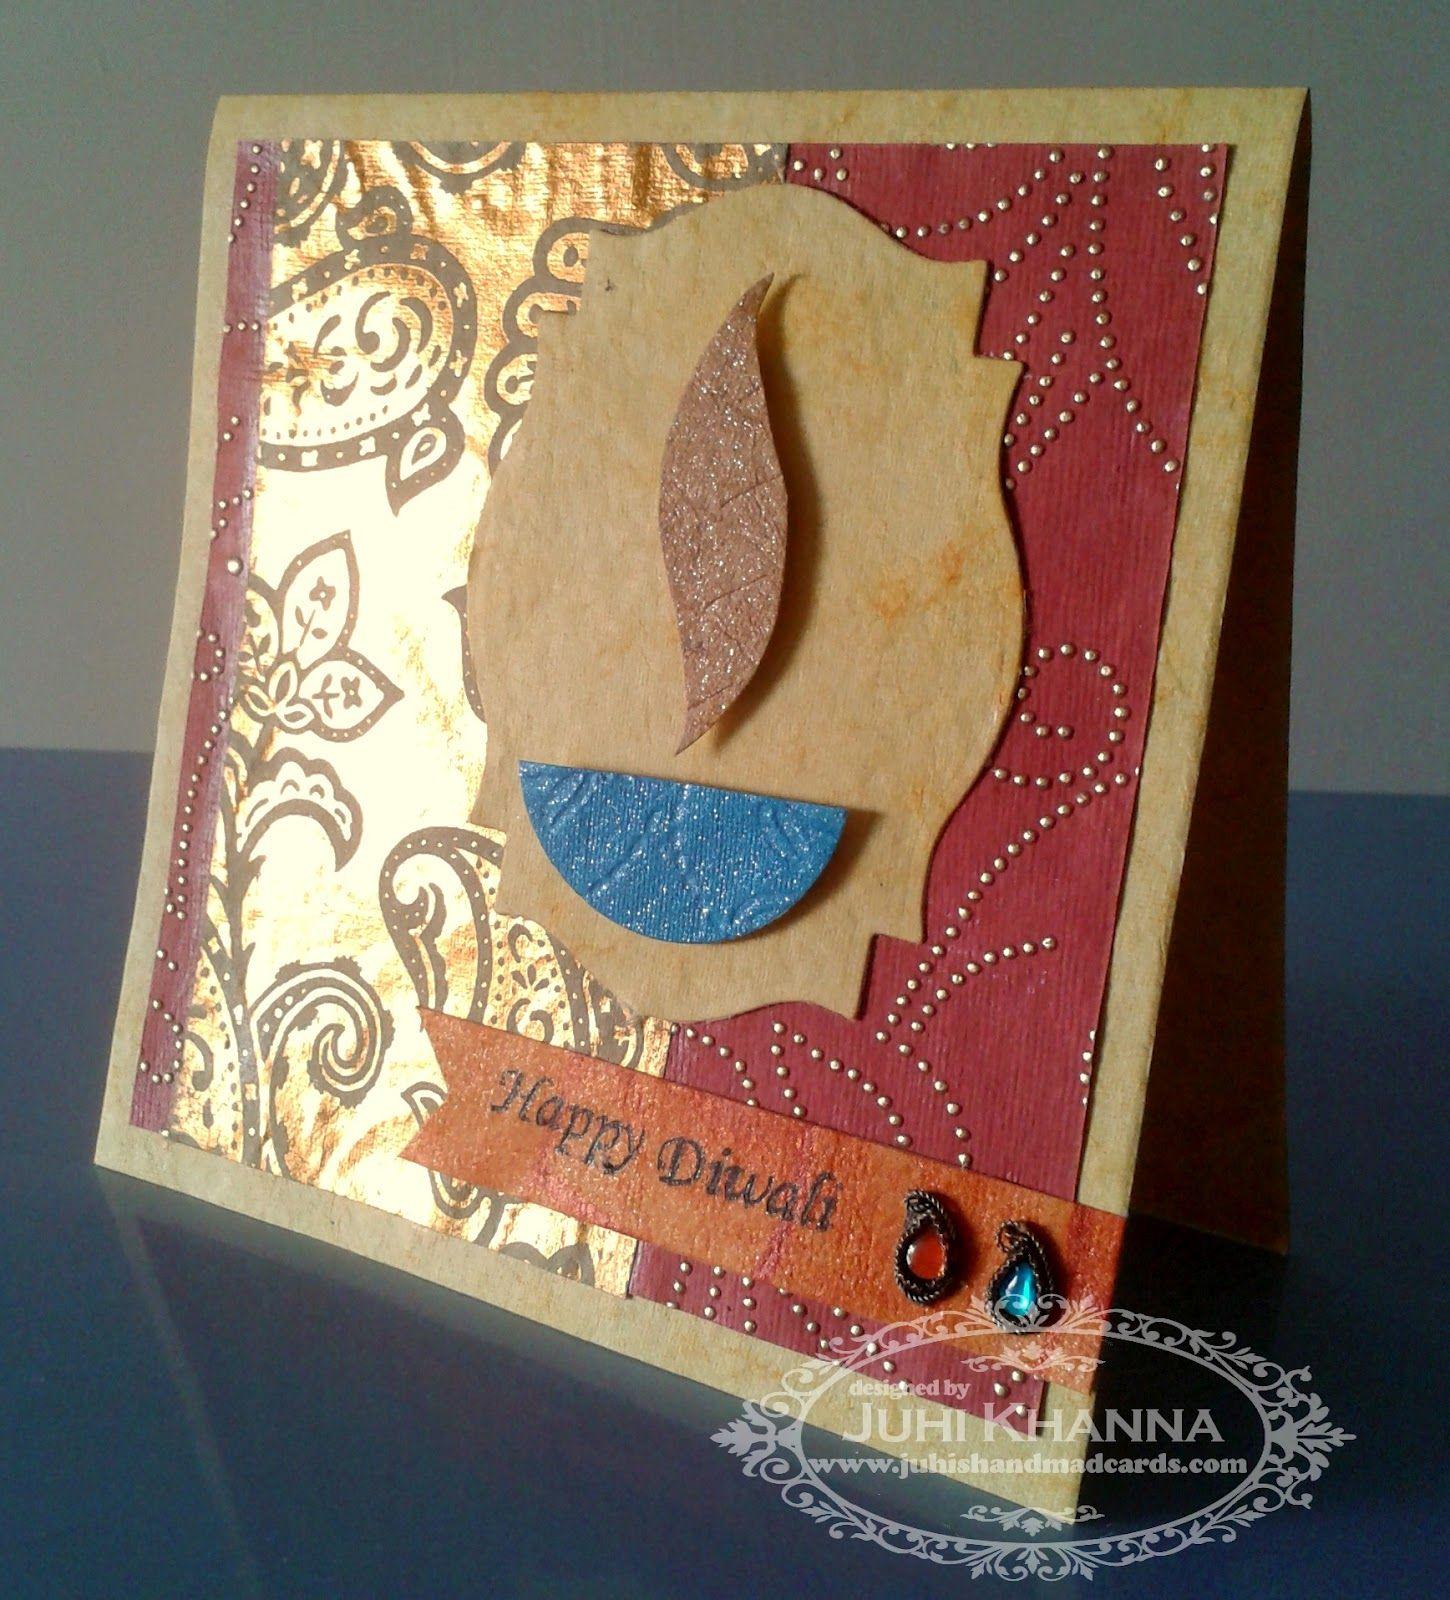 Handmade cards for diwali handmade greeting card ideas on pinterest handmade cards for diwali handmade greeting card ideas on pinterest kristyandbryce Images